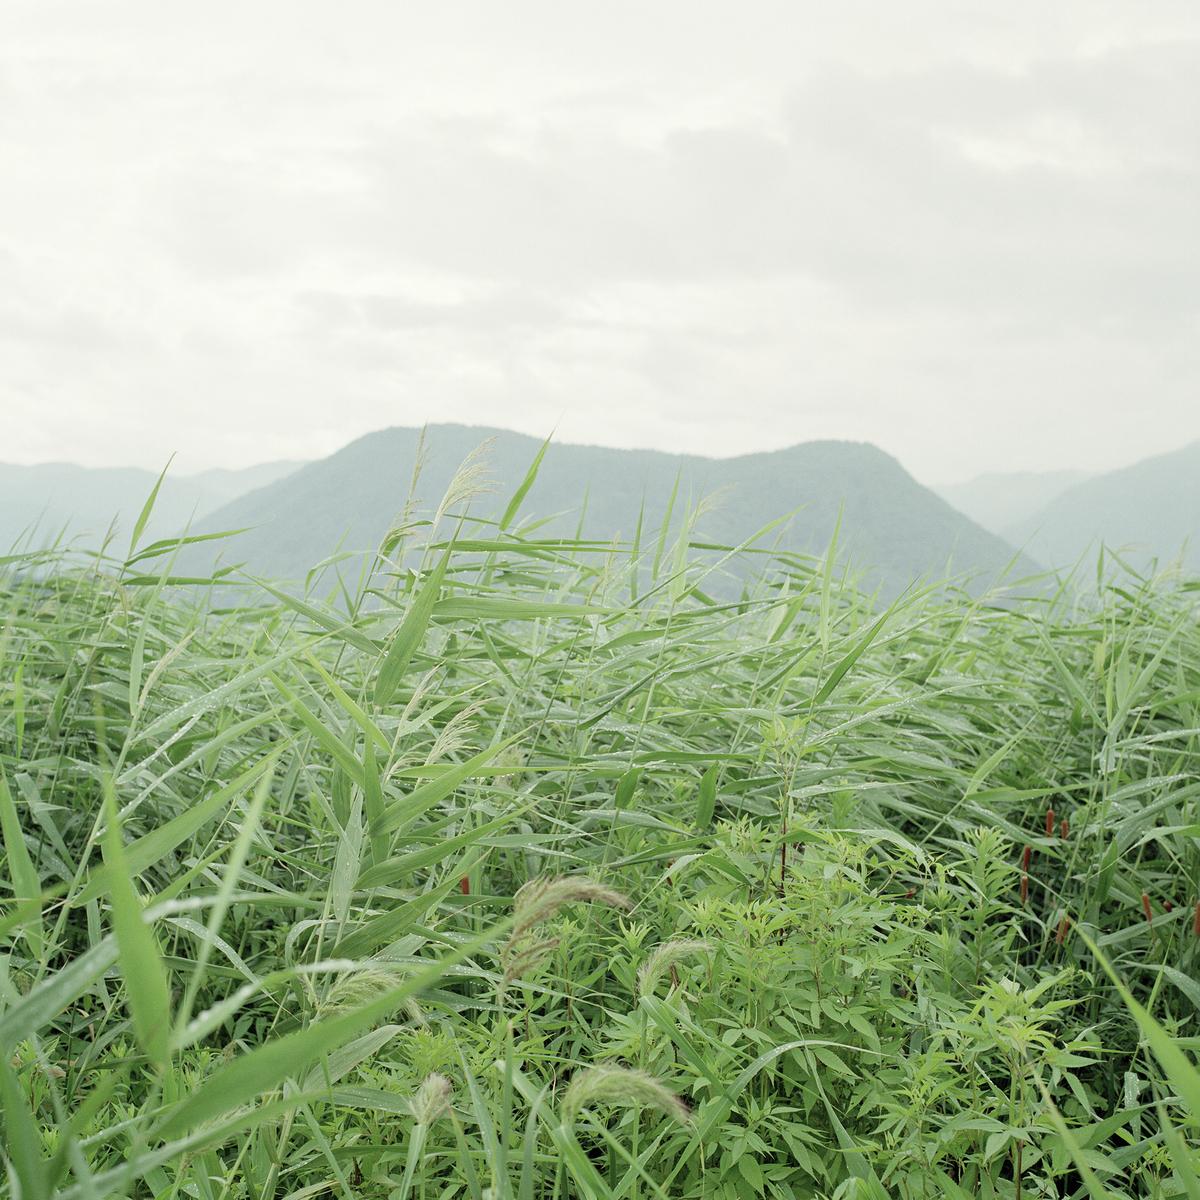 f:id:shinodayu:20200213201606j:plain